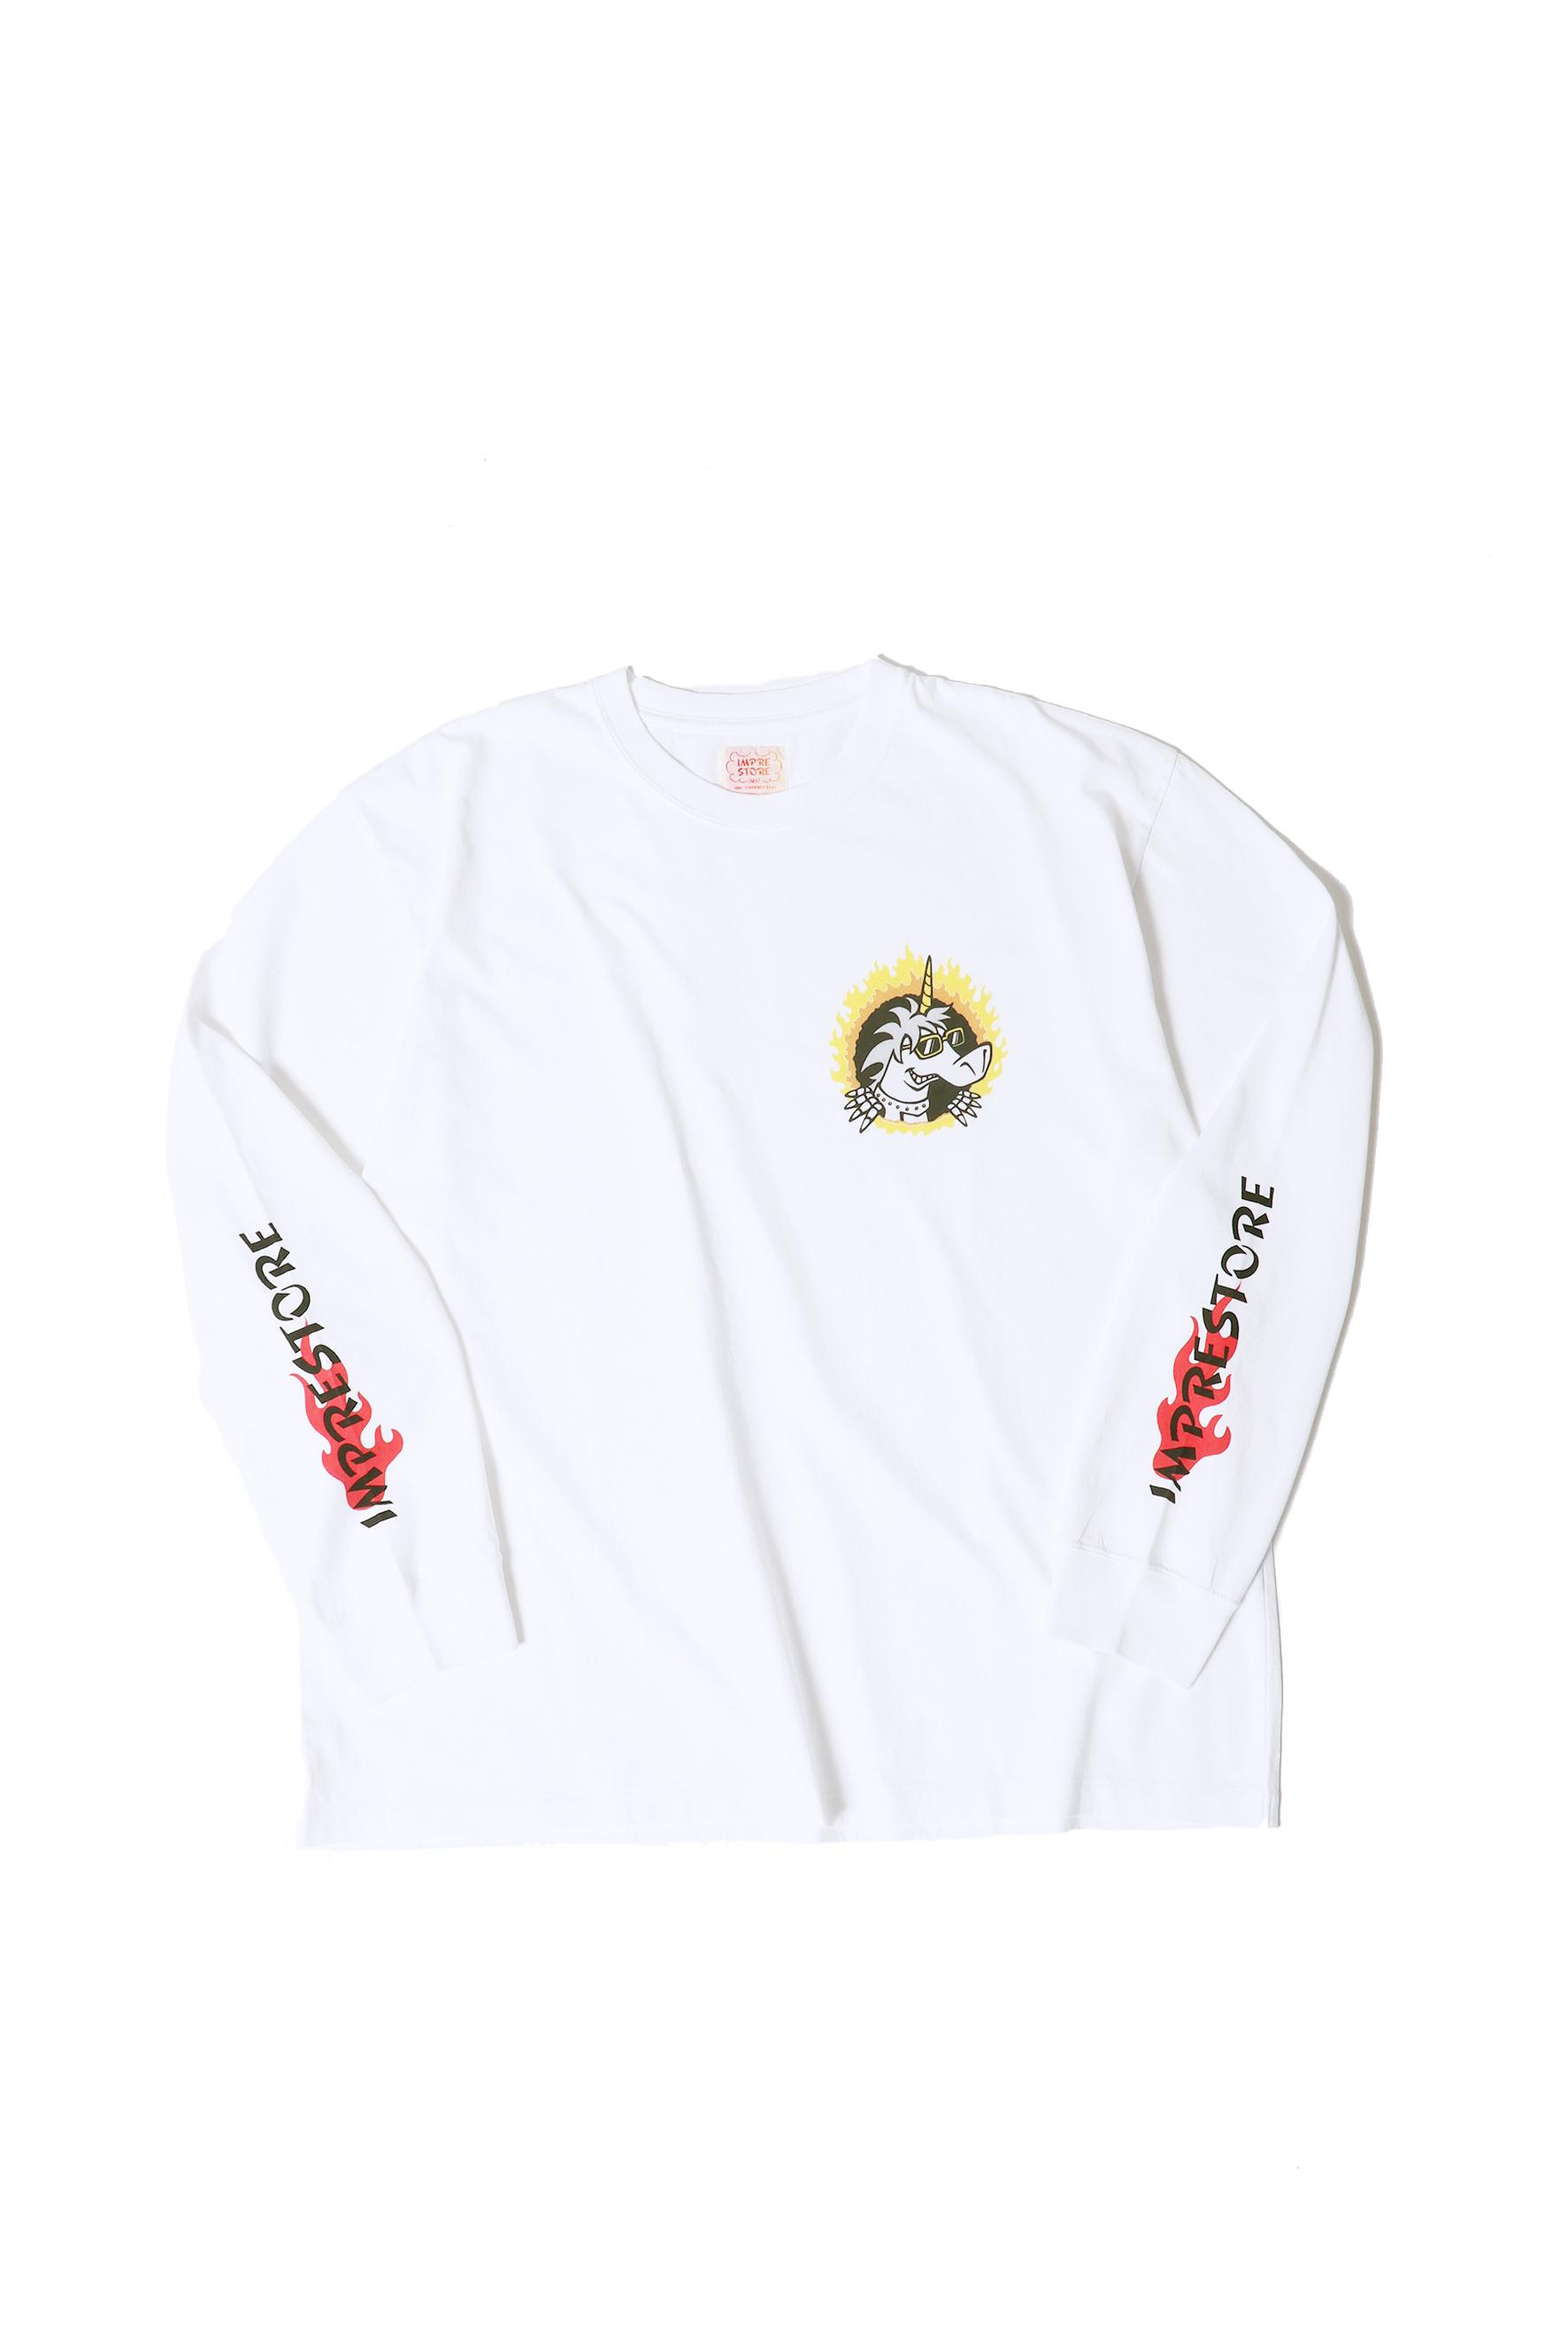 Original Long Sleeve-T / FIRE / white